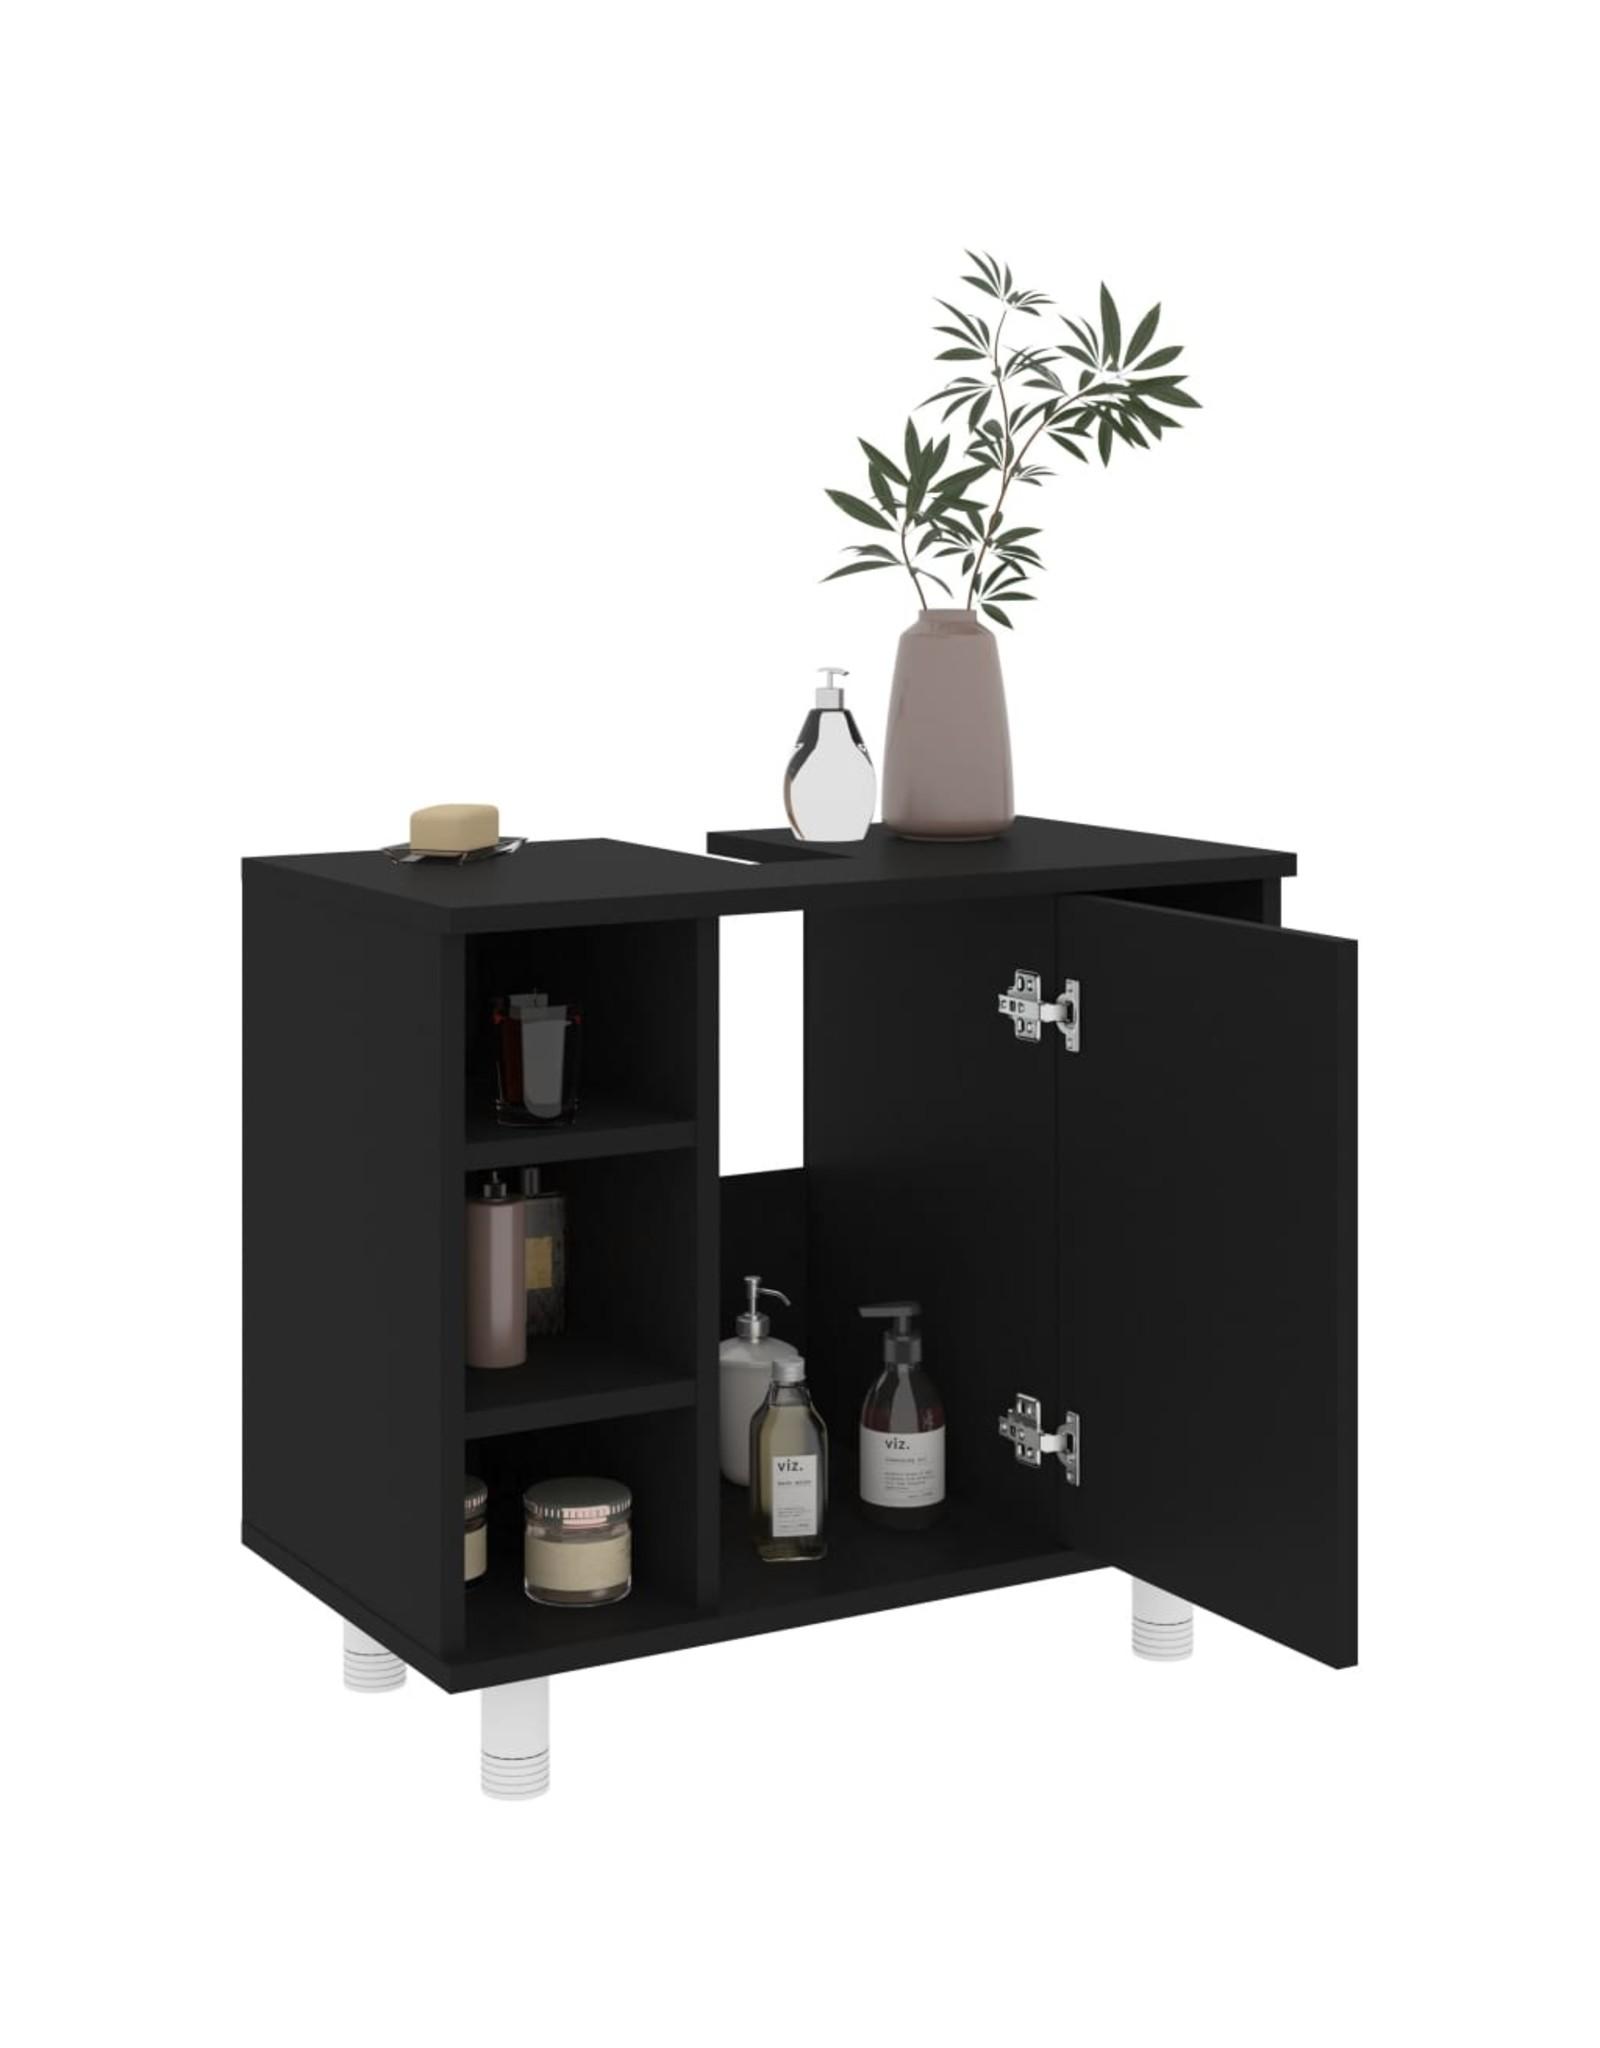 Badkamerkast 60x32x53,5 cm spaanplaat zwart